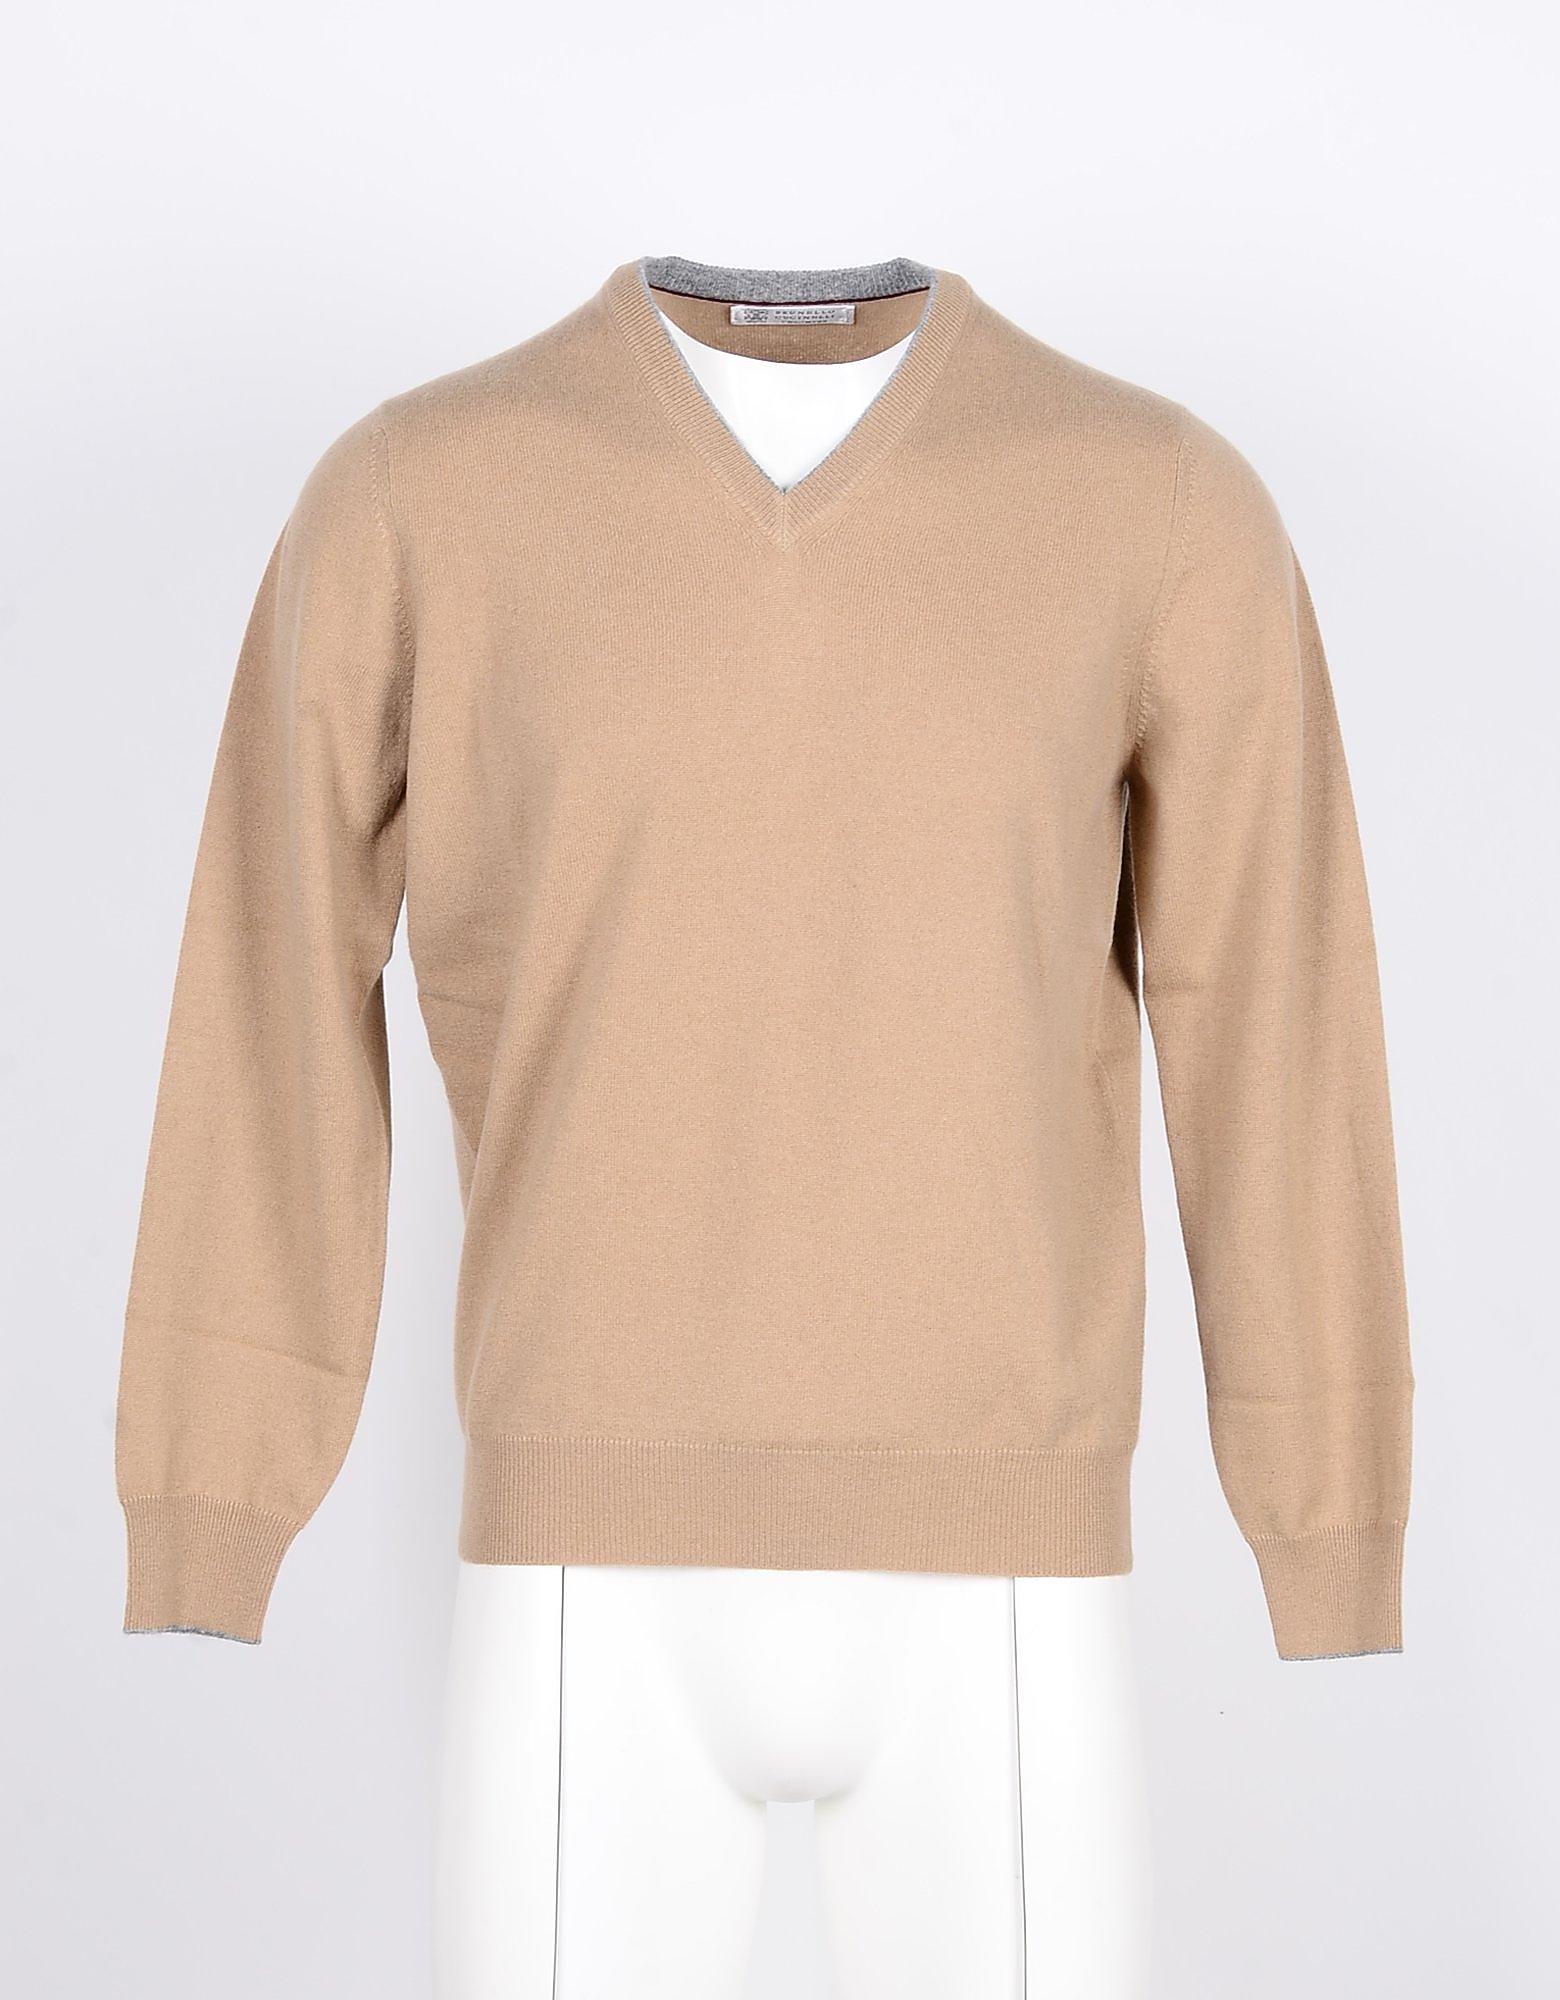 Brunello Cucinelli Designer Knitwear, Beige Pure cashmere Men's V-neck Sweater